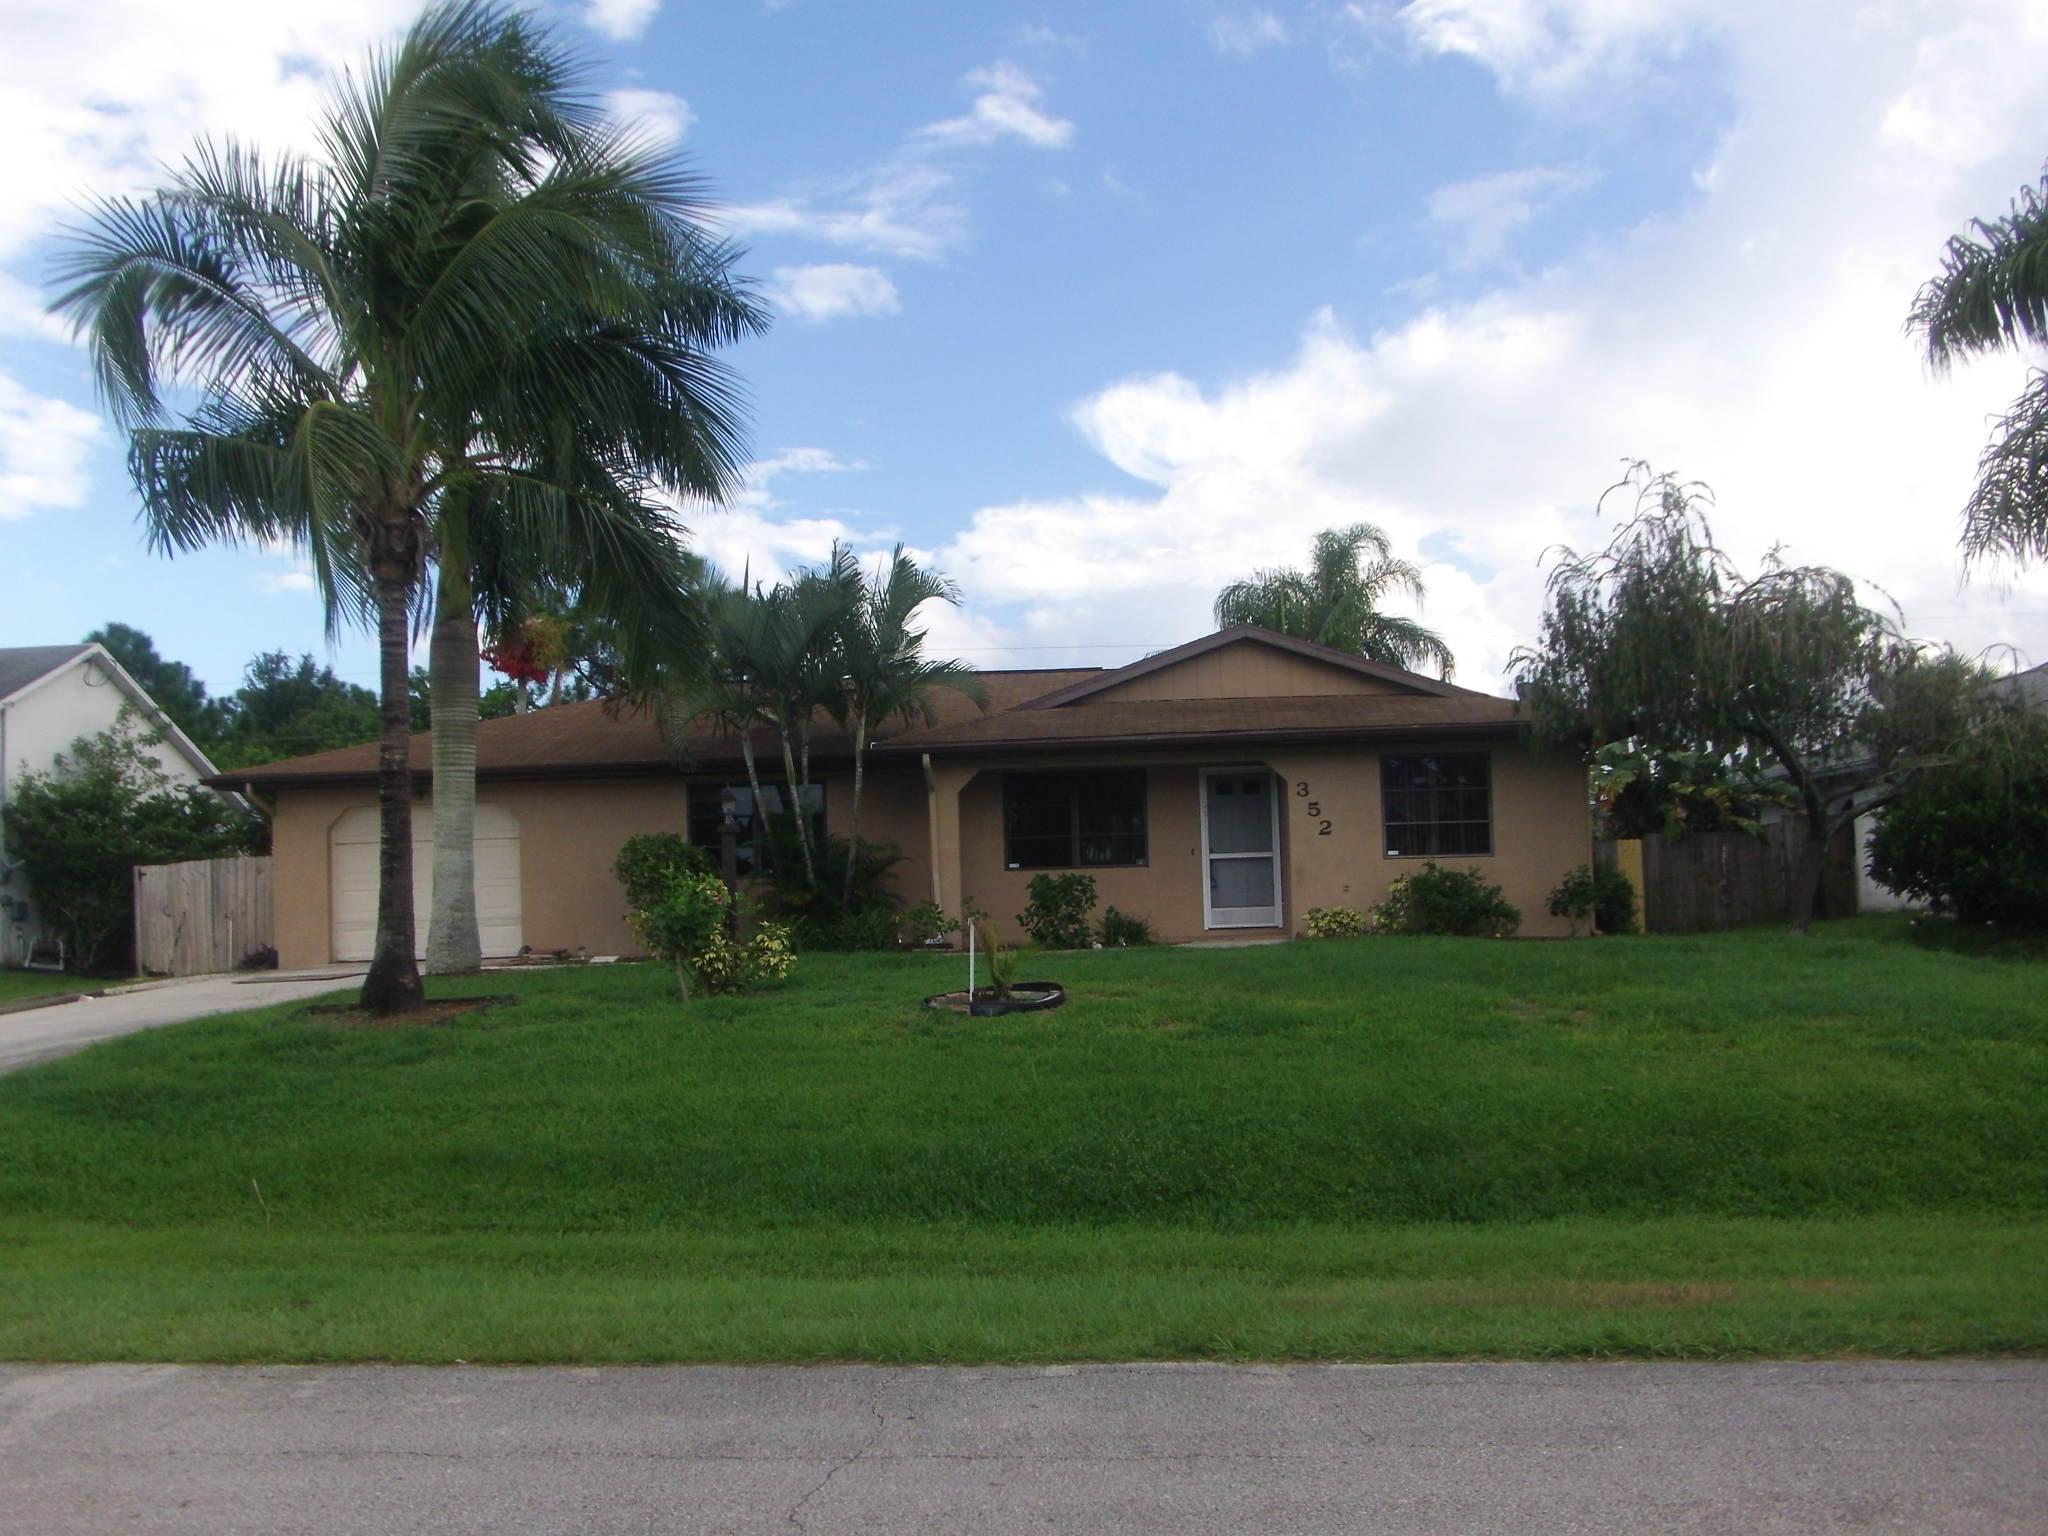 352 Sw Molloy Street, Port Saint Lucie, FL 34984